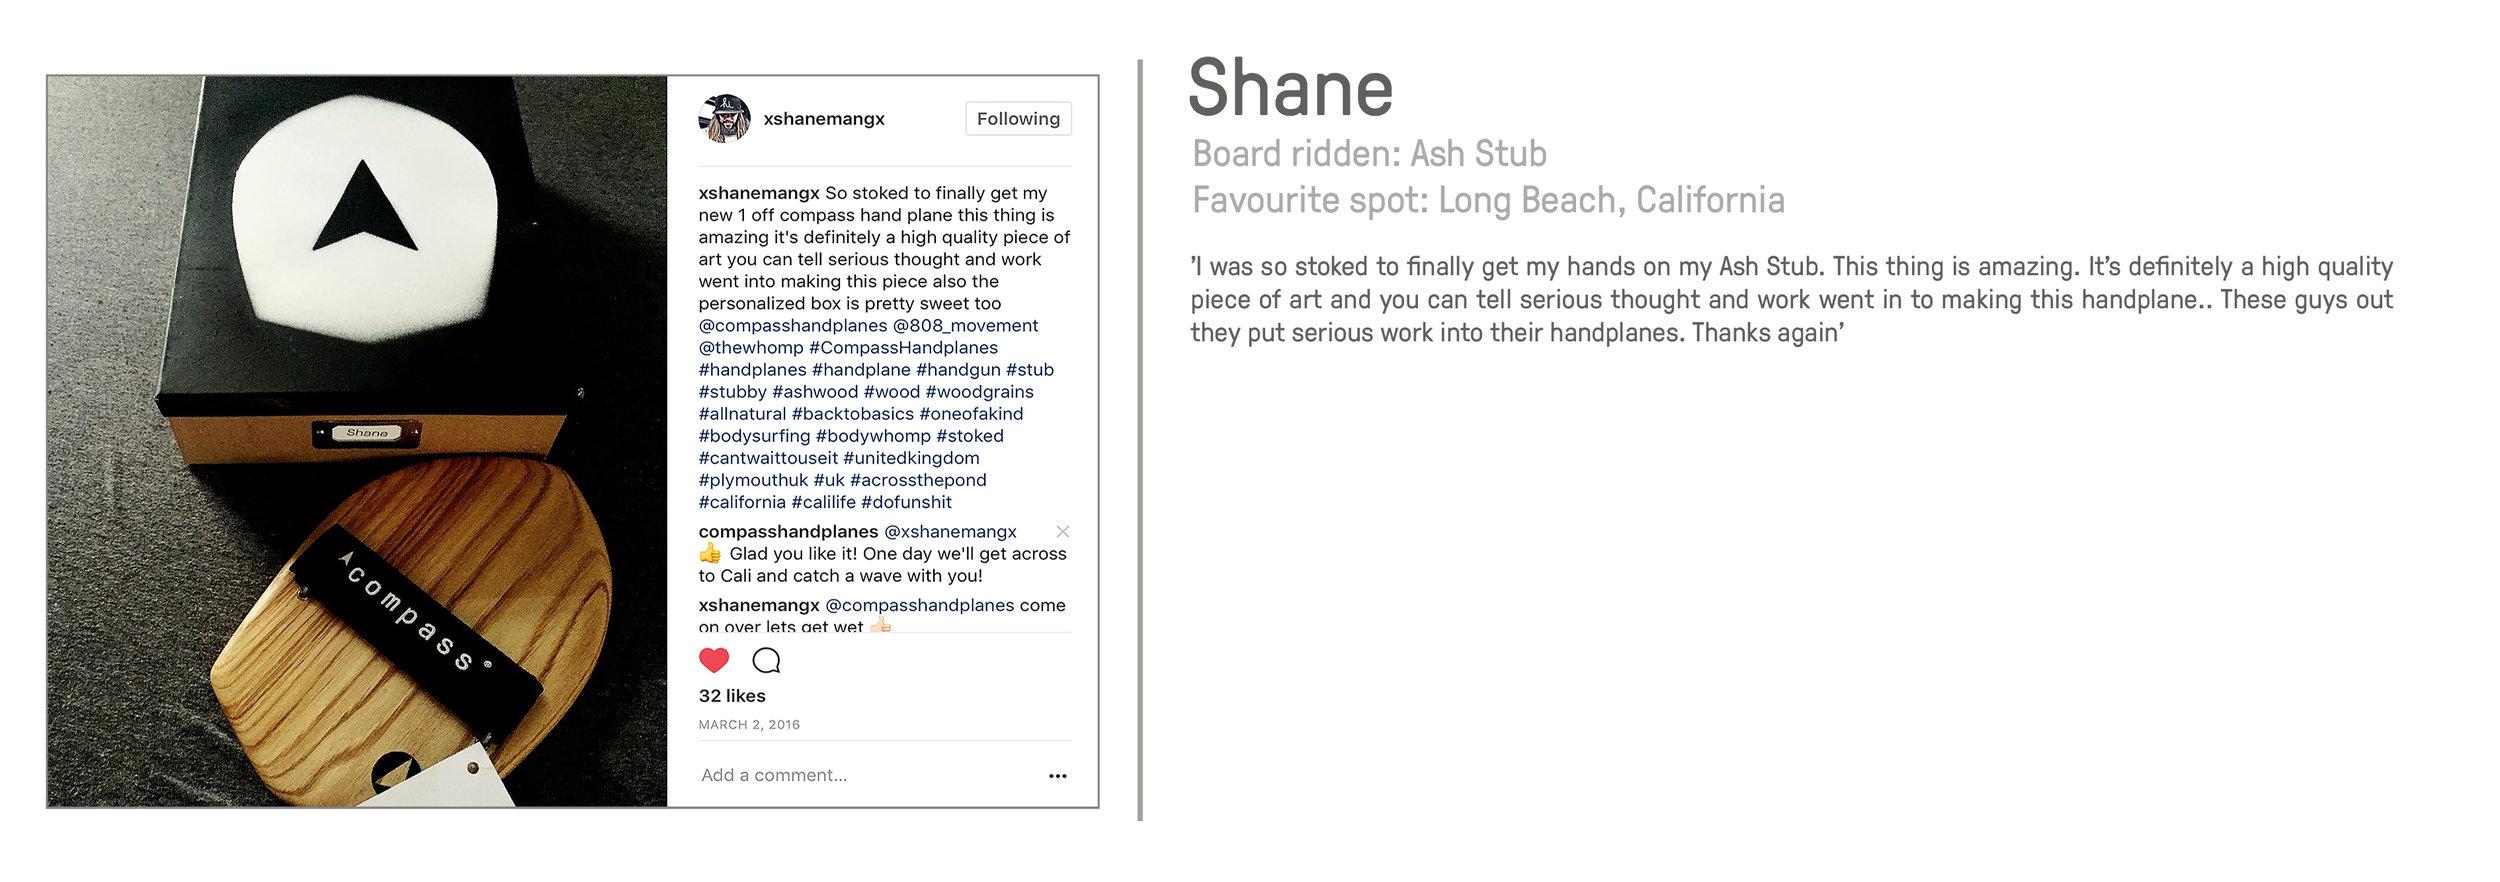 Shane America California bodysurfing bodysurf great review Compass Handplanes handplane